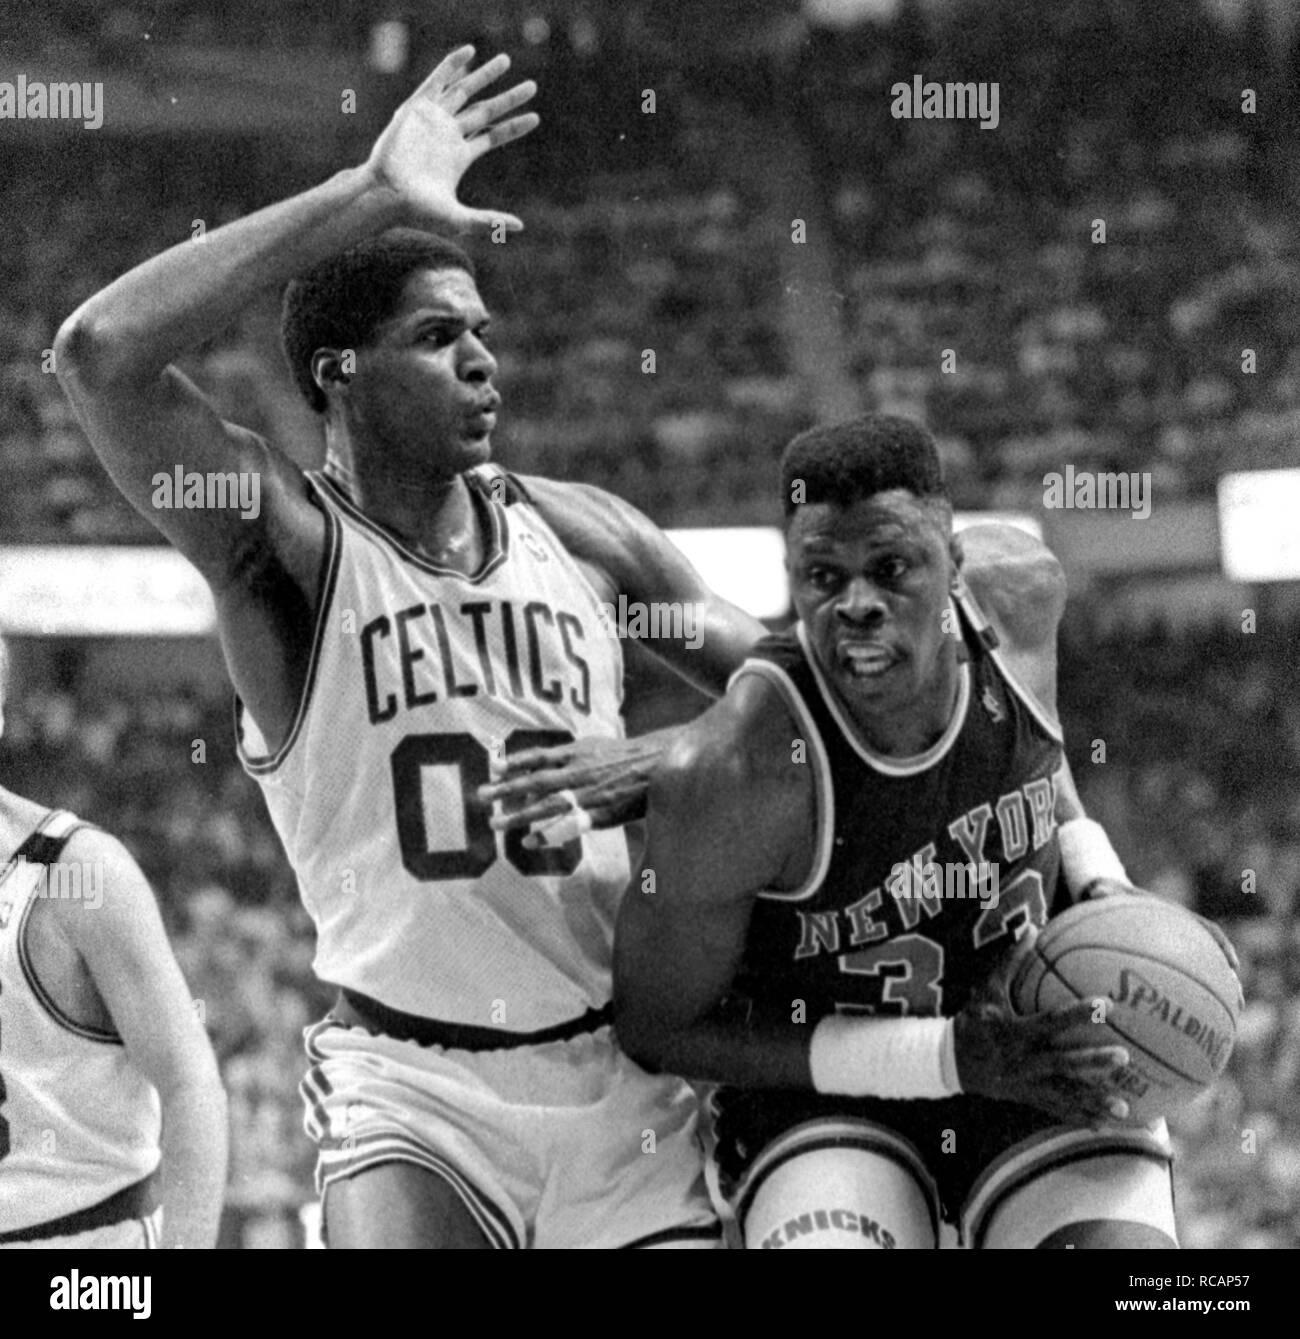 Game action NY Knicks Patrick Ewing and Bosotn Celtics Robert Parish at the Fleet Center in Boston Ma USA 1997 photo by bill belknap Stock Photo